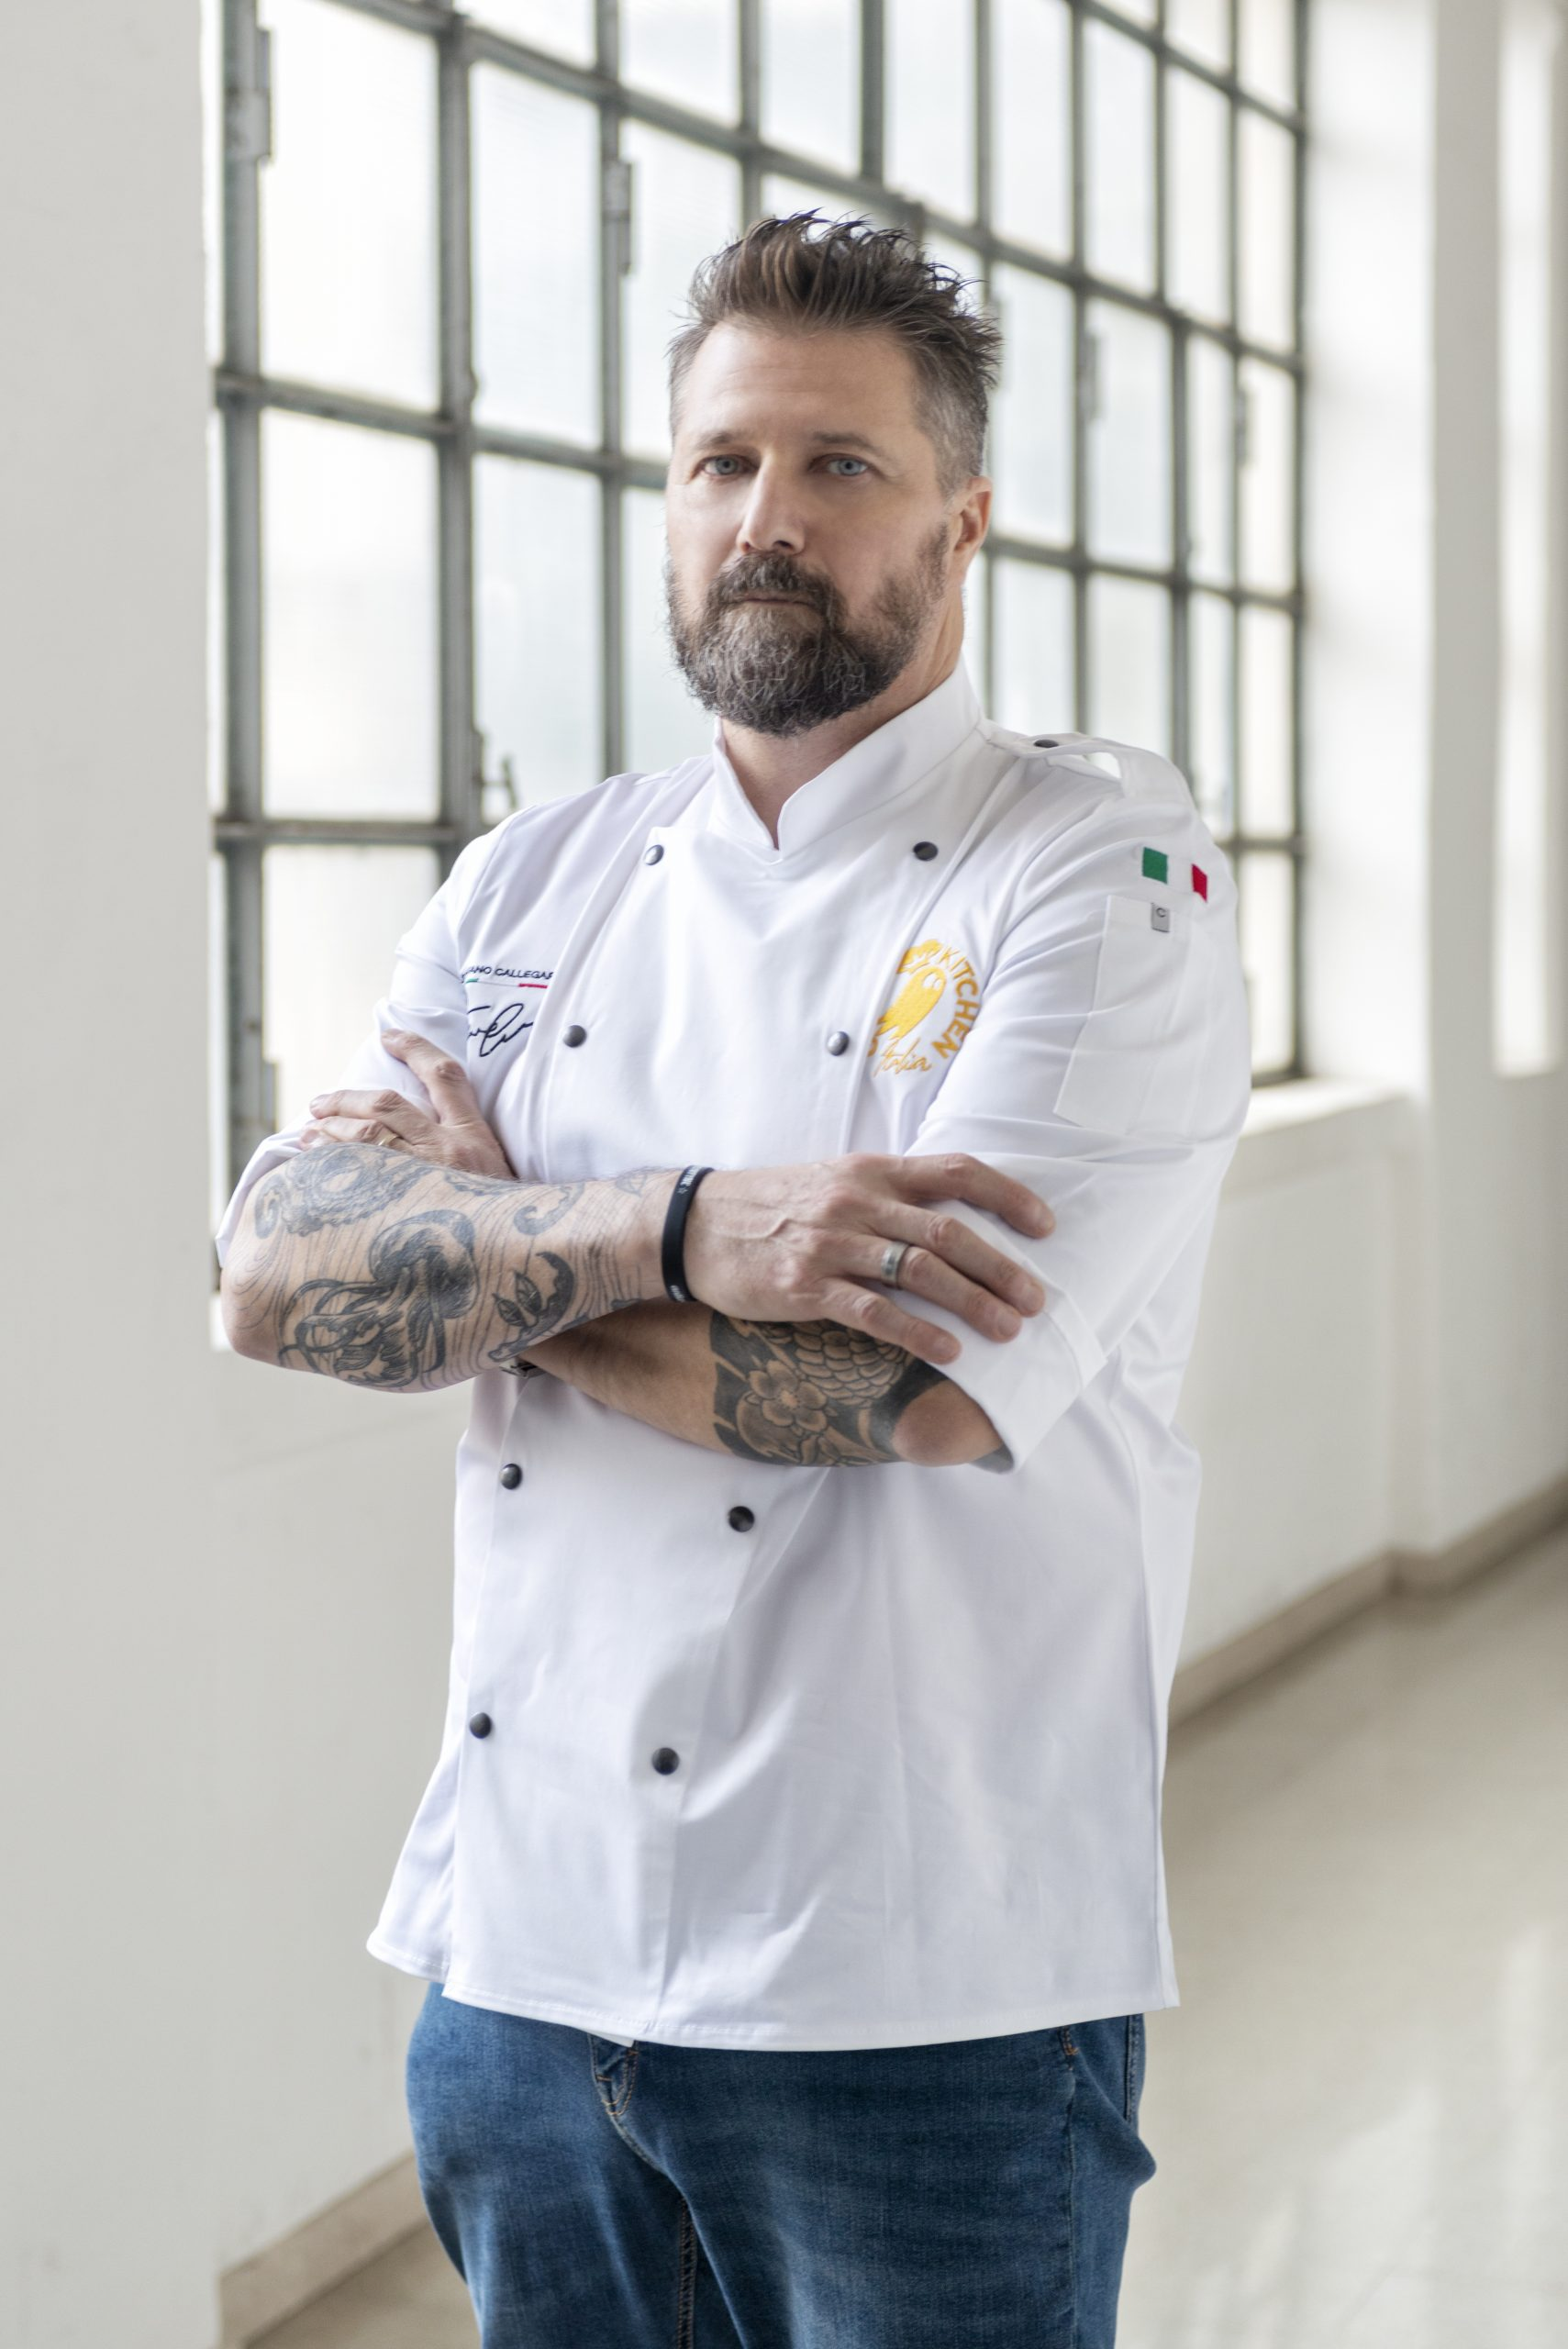 stefano callegaro ghost kitchen italia